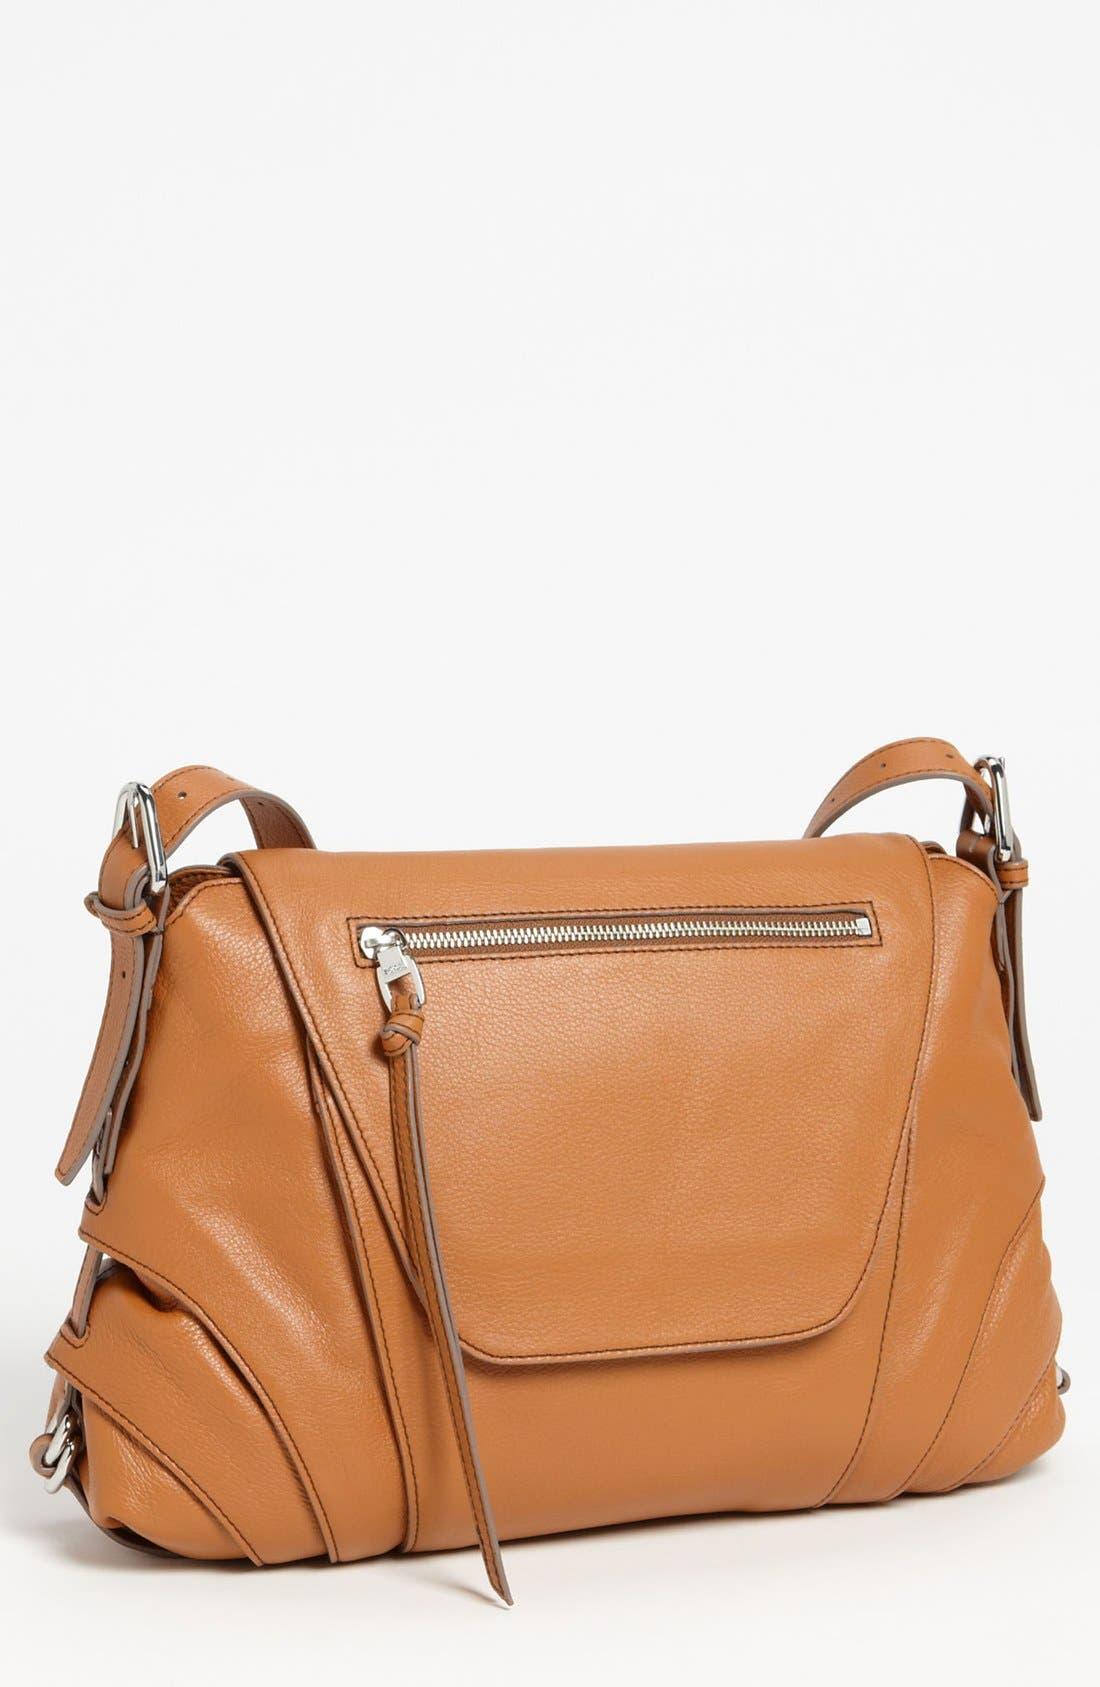 KOOBA 'Brielle' Leather Crossbody Bag, Main, color, 210